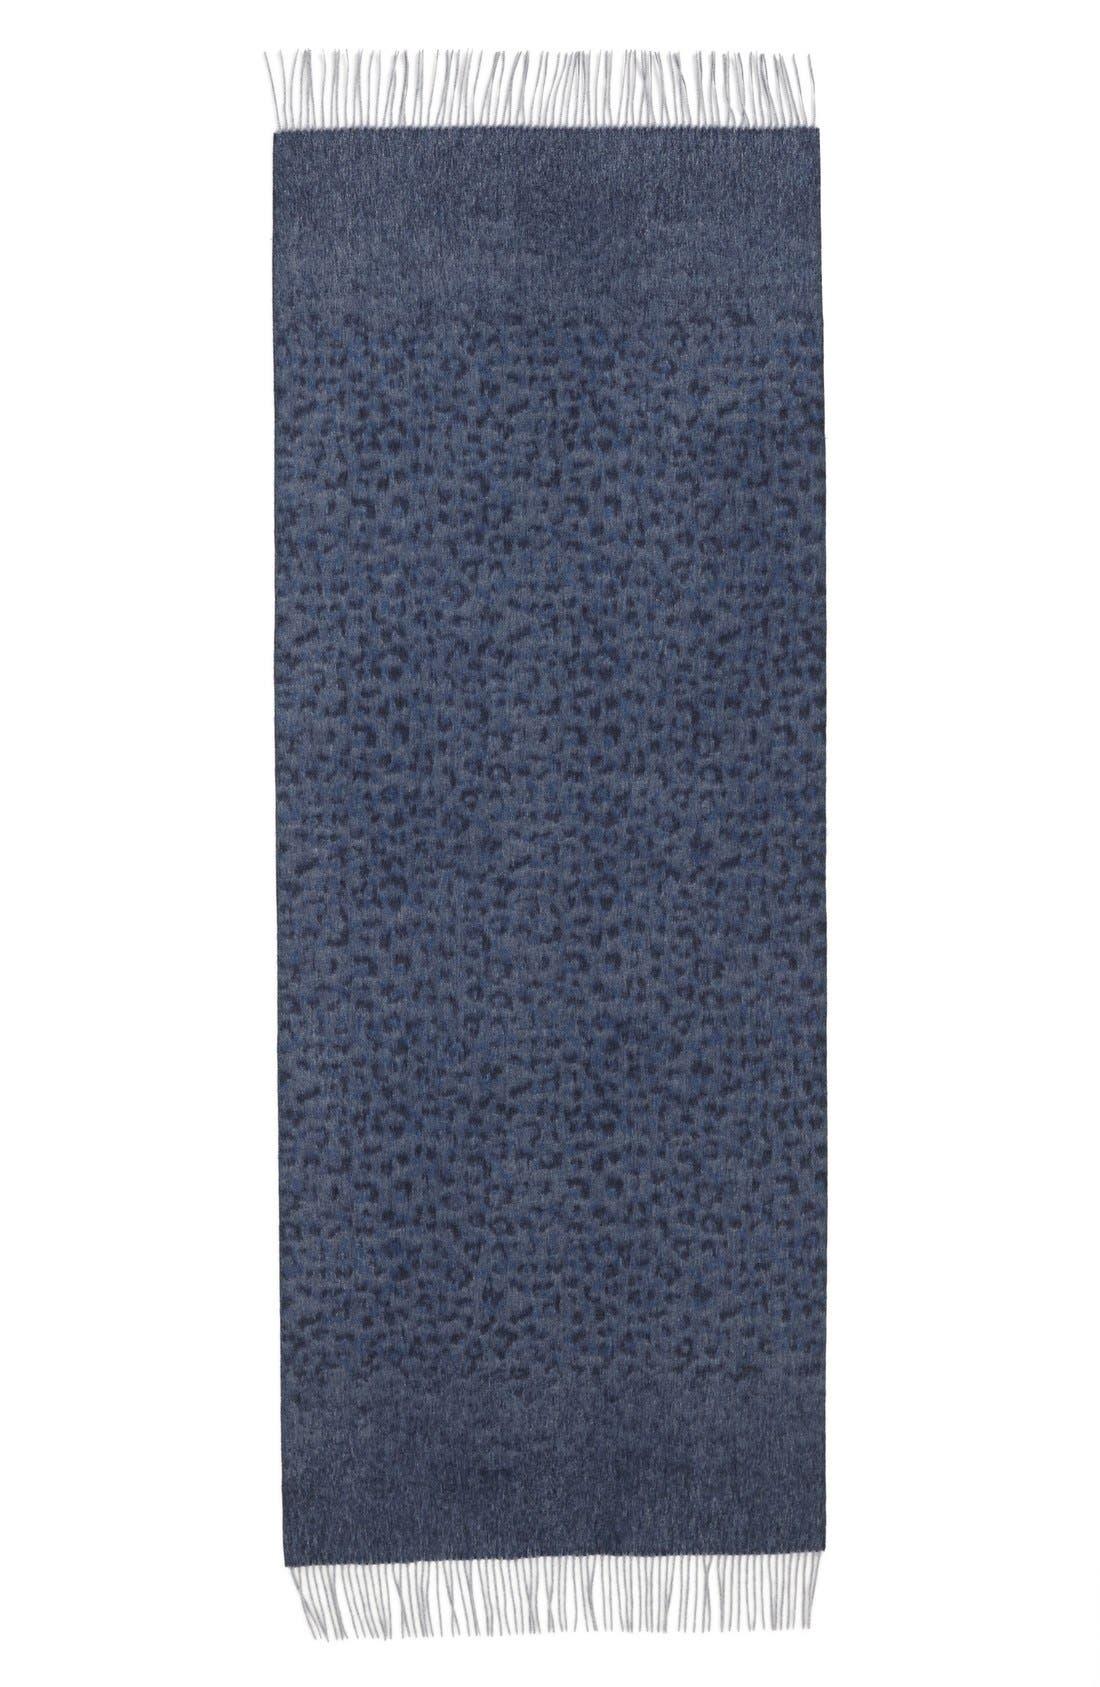 NORDSTROM COLLECTION,                             'Elusive' Cashmere Wrap,                             Alternate thumbnail 2, color,                             020